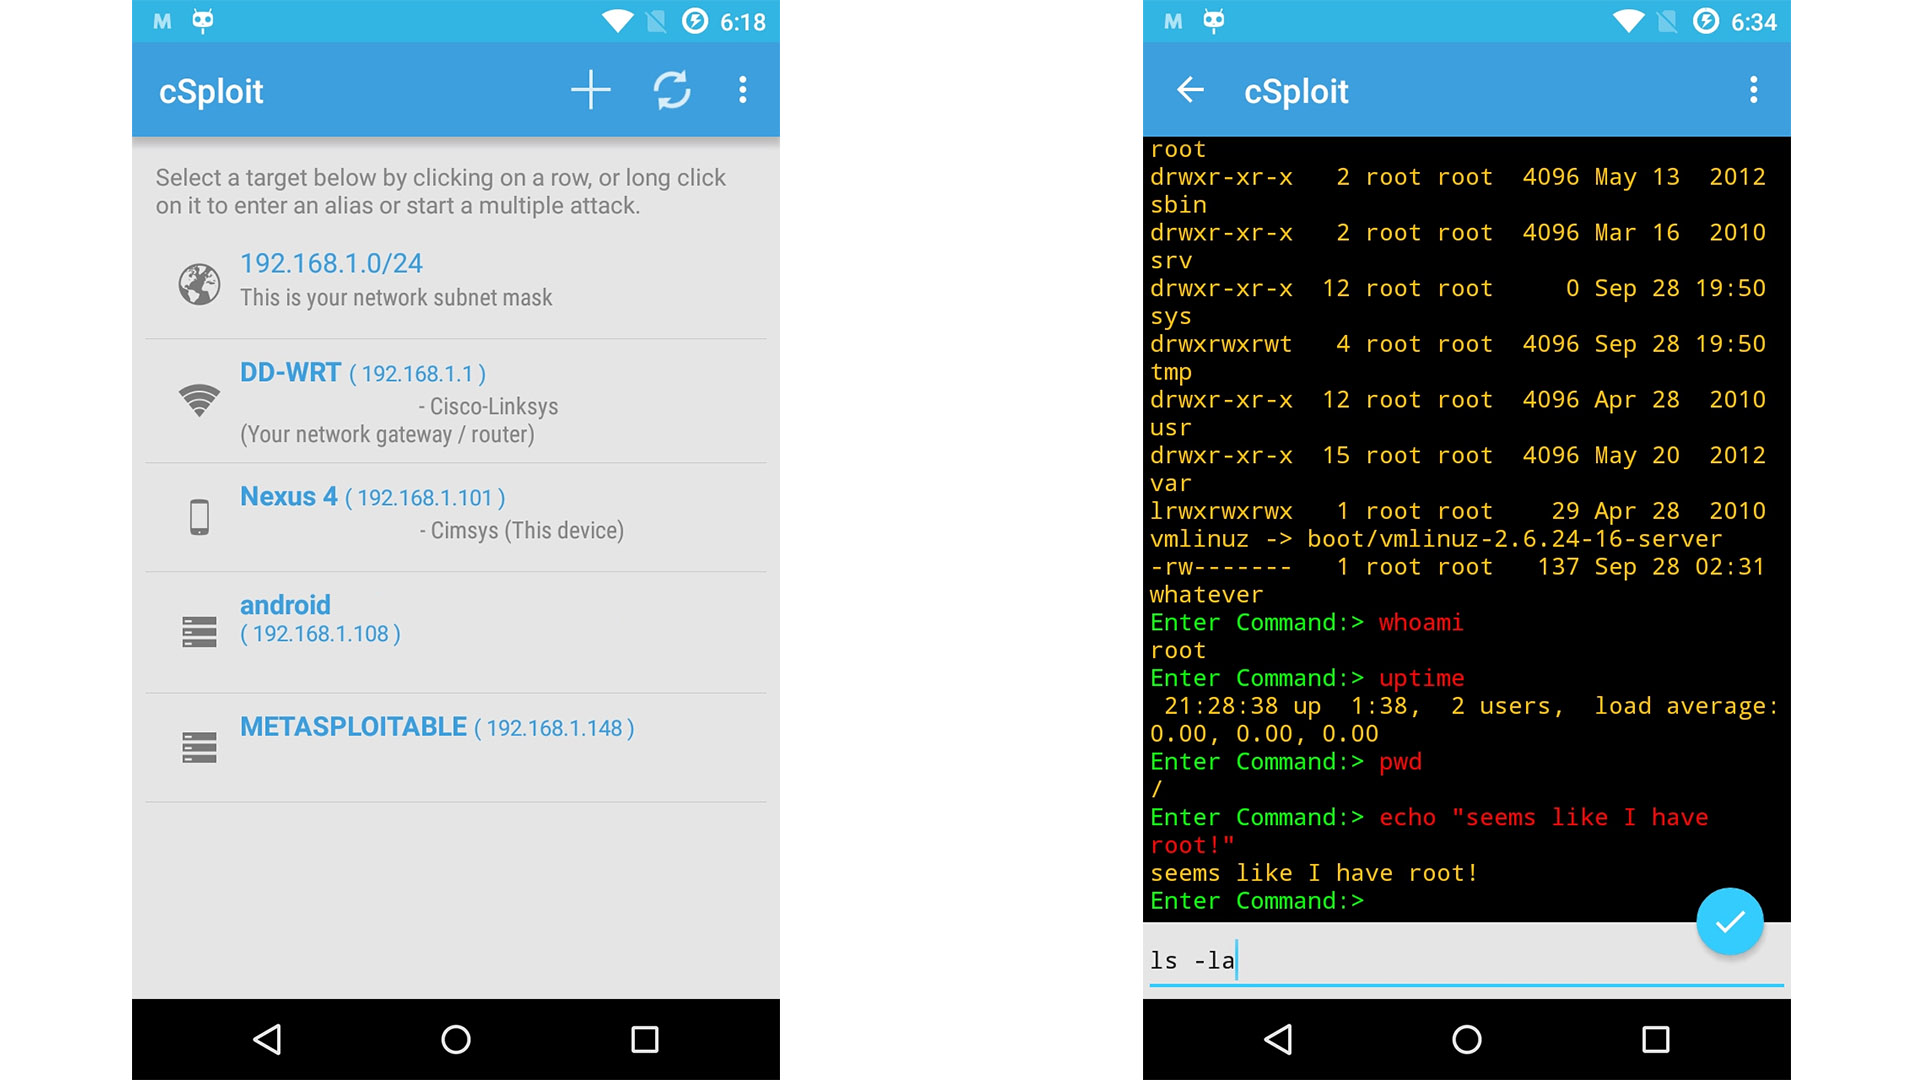 cSploit screenshot